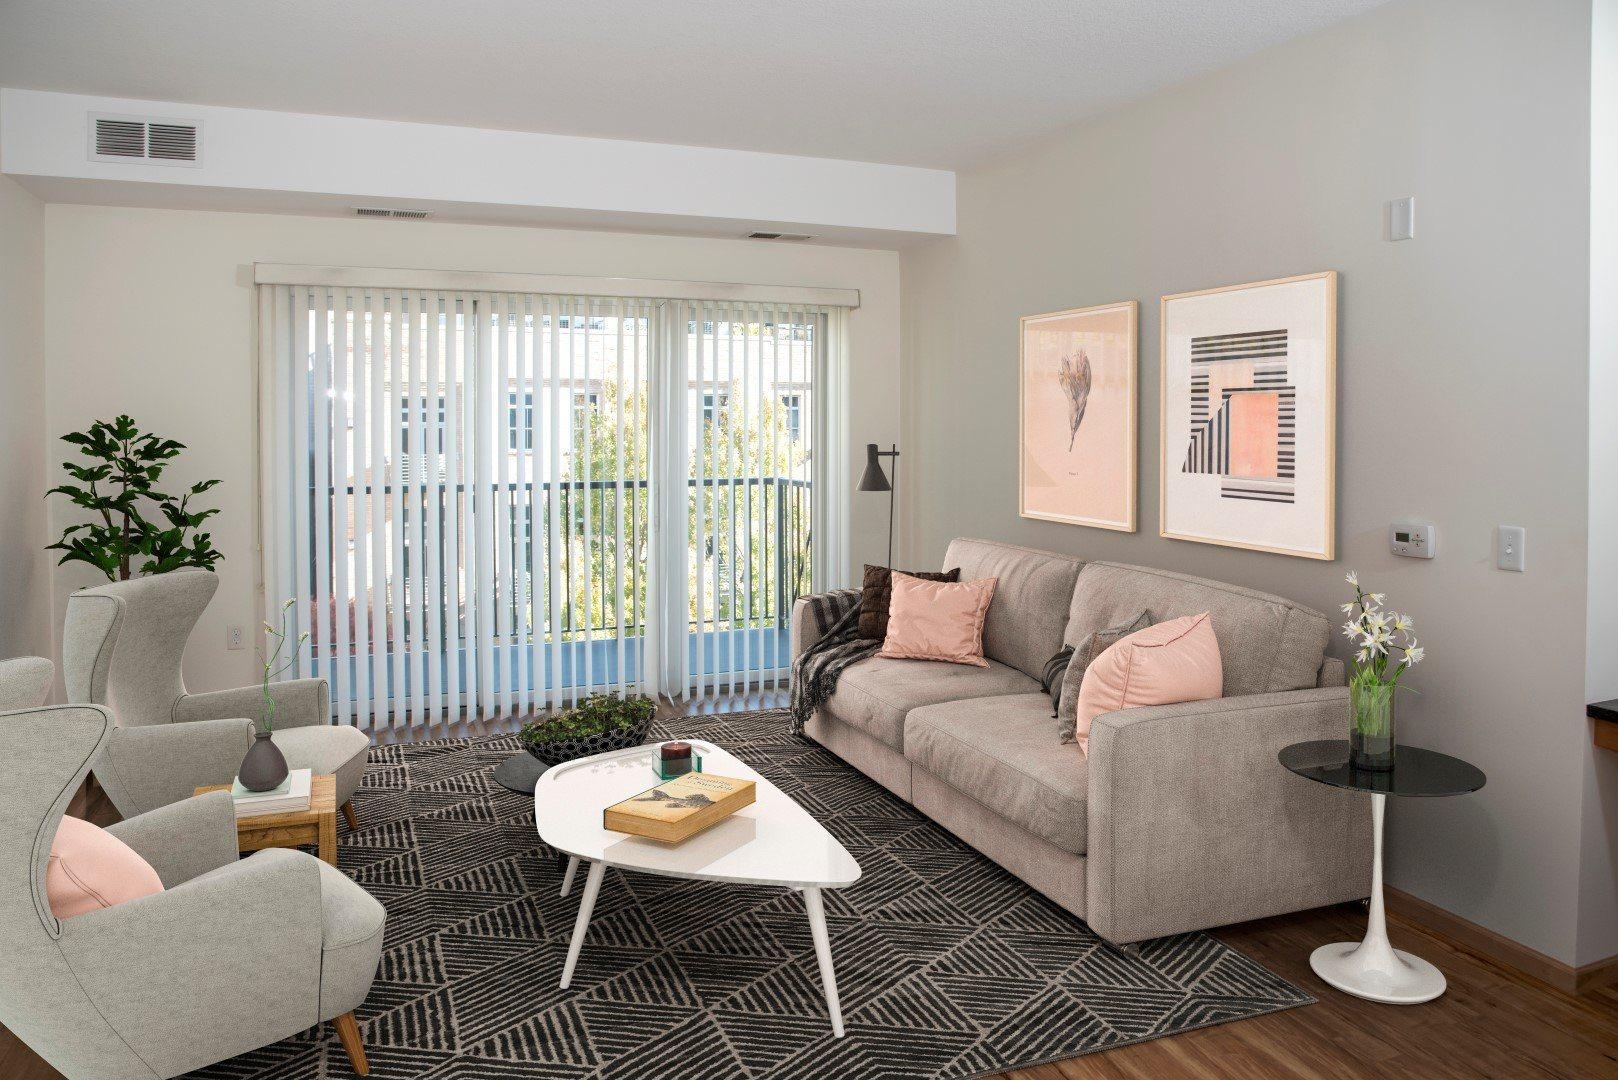 Third North apartments in North Loop Minneapolis